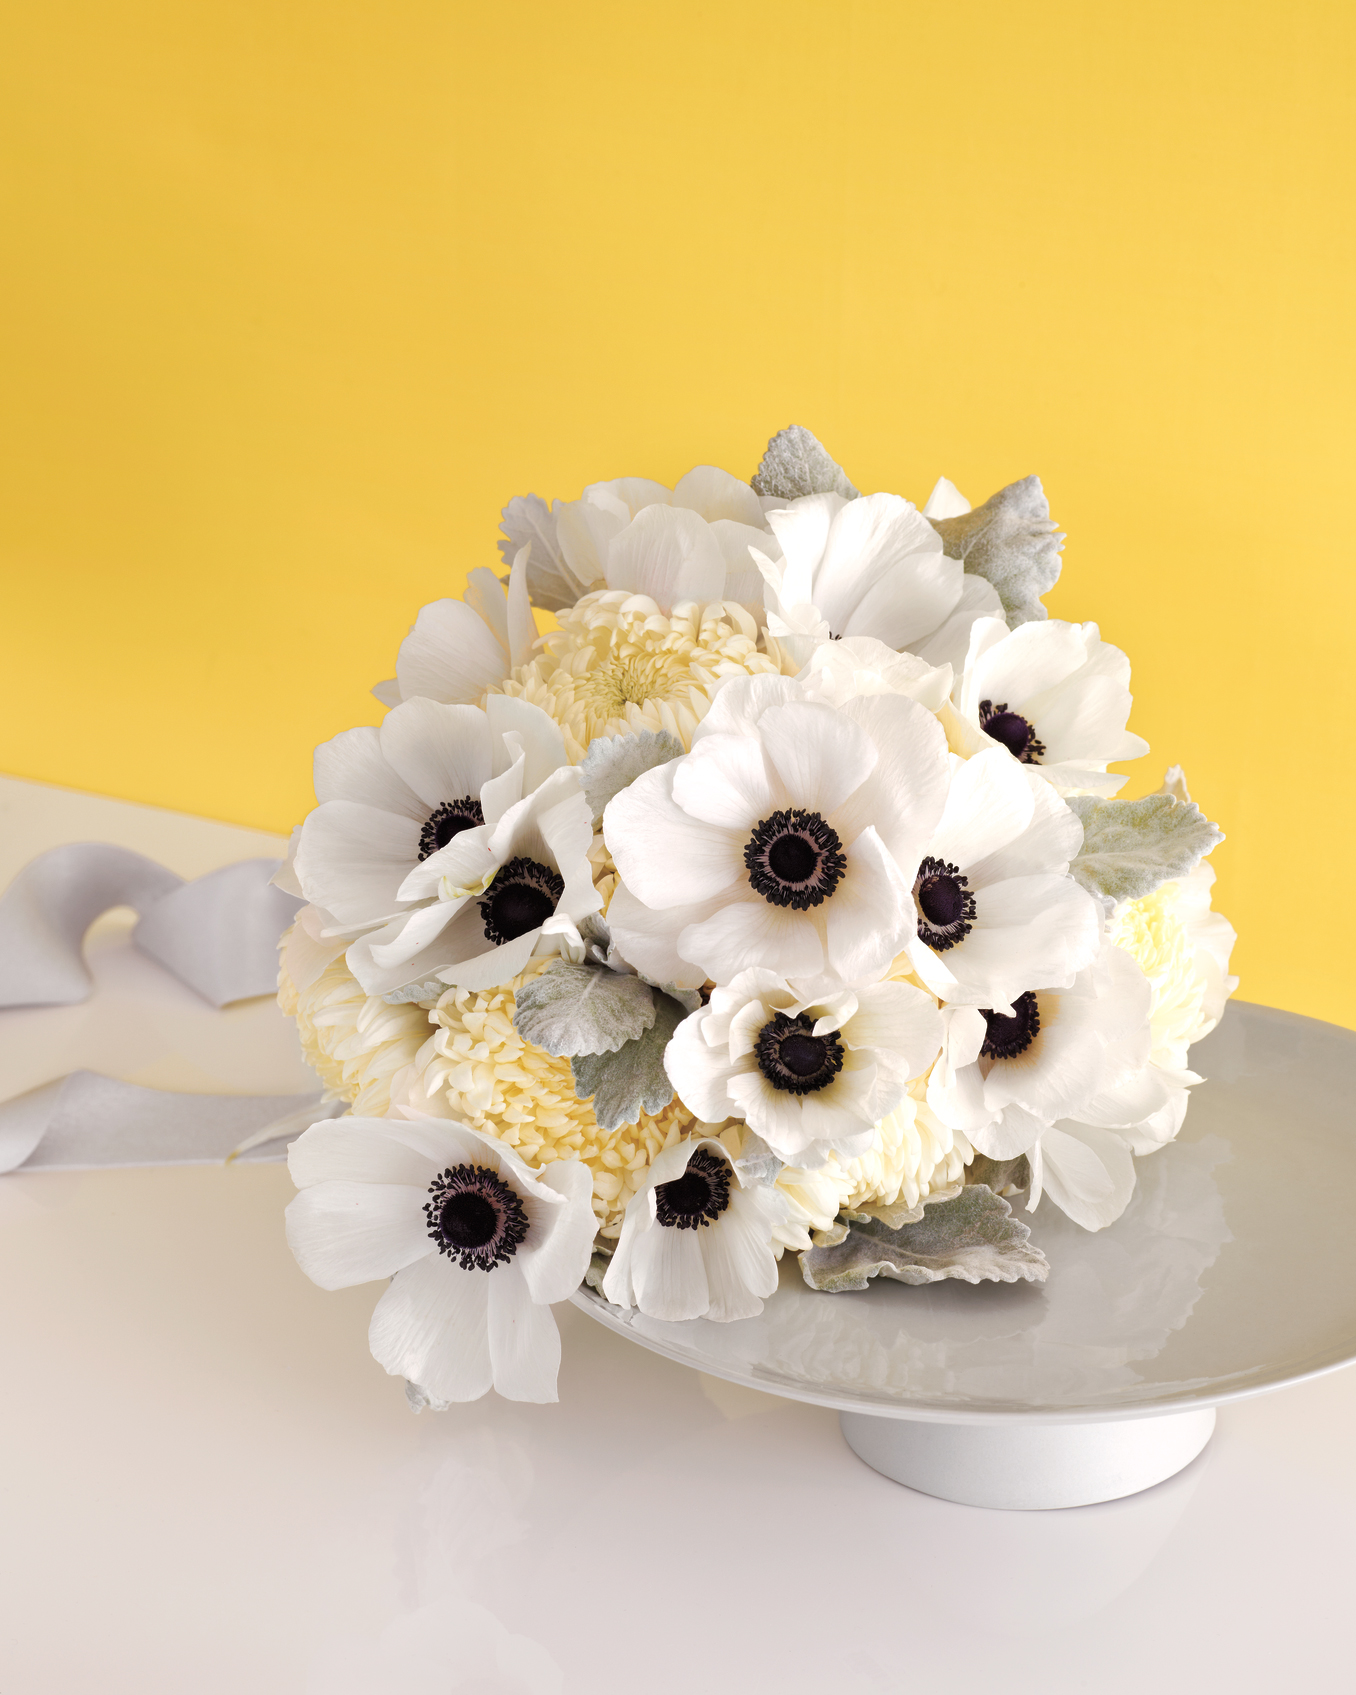 fabric-flowers-marib16-md108763.jpg